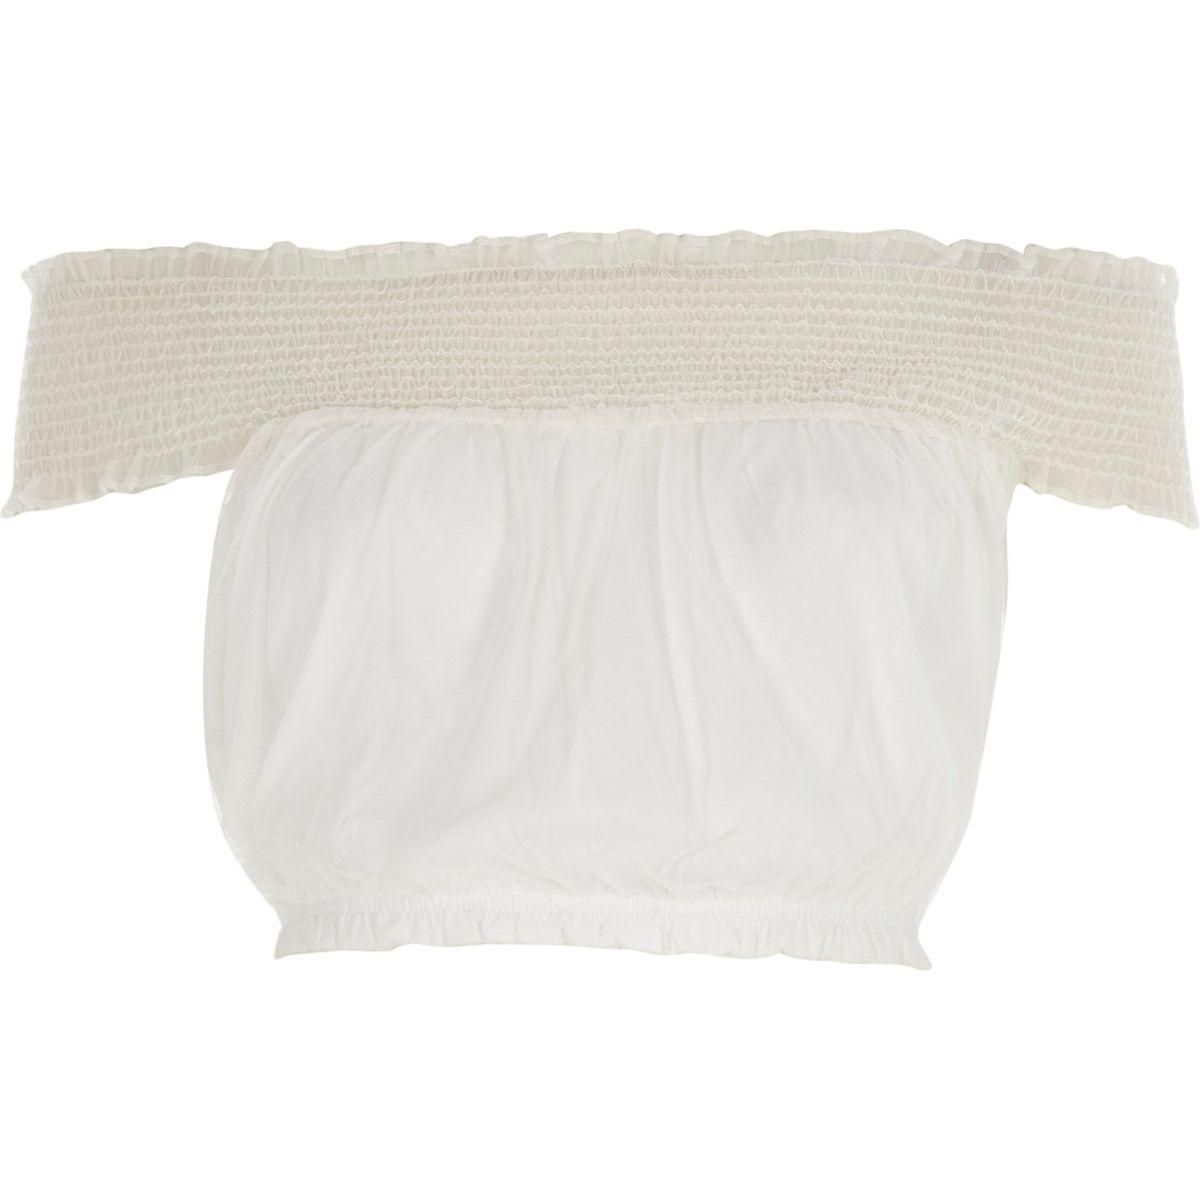 White mesh shirred bardot crop top